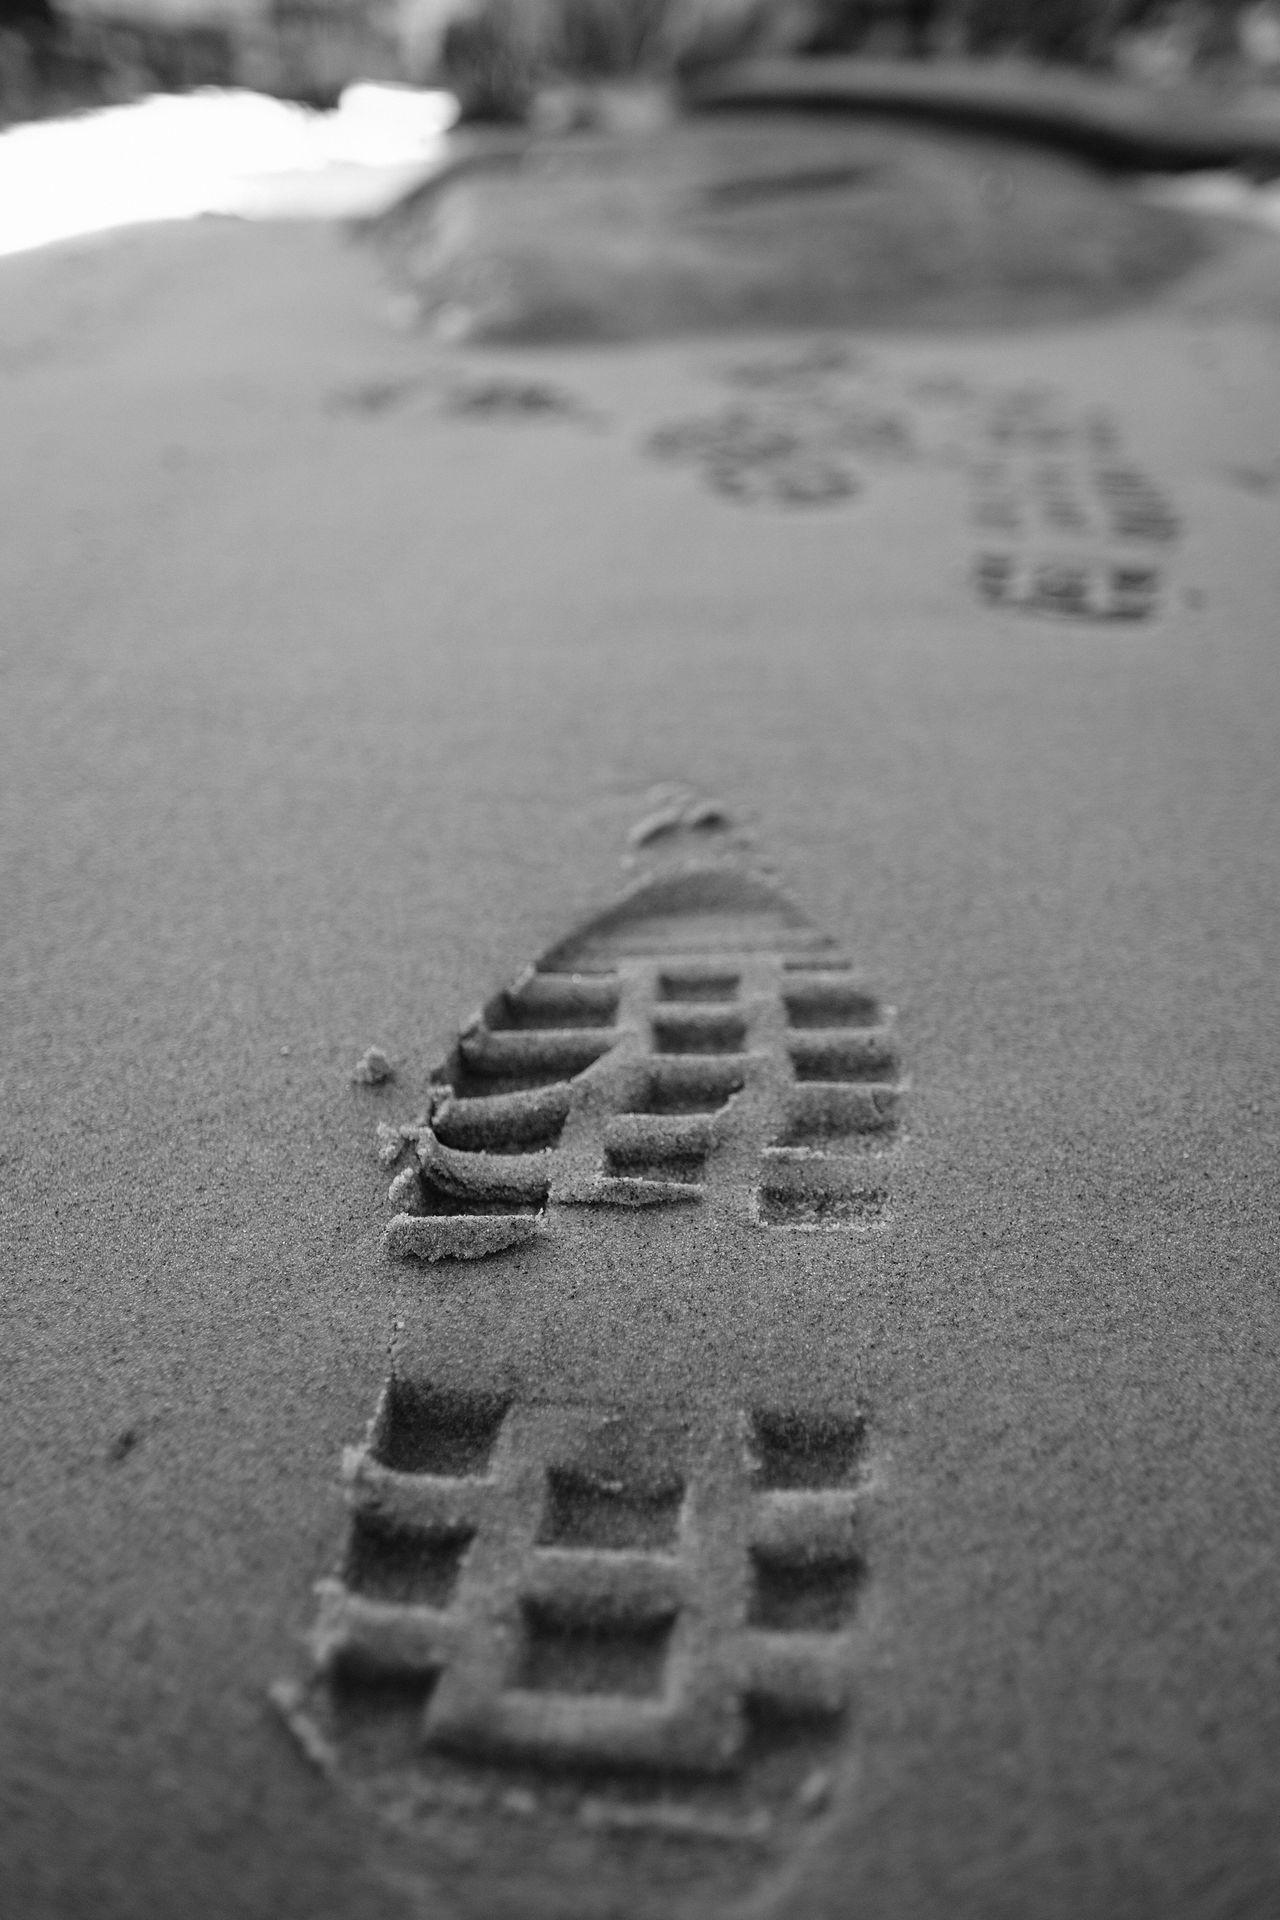 Try walking in my shoes Beach Sand Shoeprints Nature Outdoors Fujifilm_xseries Fujifilm XT-2 Blackandwhite Eyeem Monochrome Eyeem Sweden FUJIFILM X-T2 XF16mmF1.4 Monochrome AcroS EyeEm Best Shots - Black + White Kungshamn Sweden Monochrome Sverige Taking Photos Fujilove Sweden X-t2 Svartvitt Close-up Day